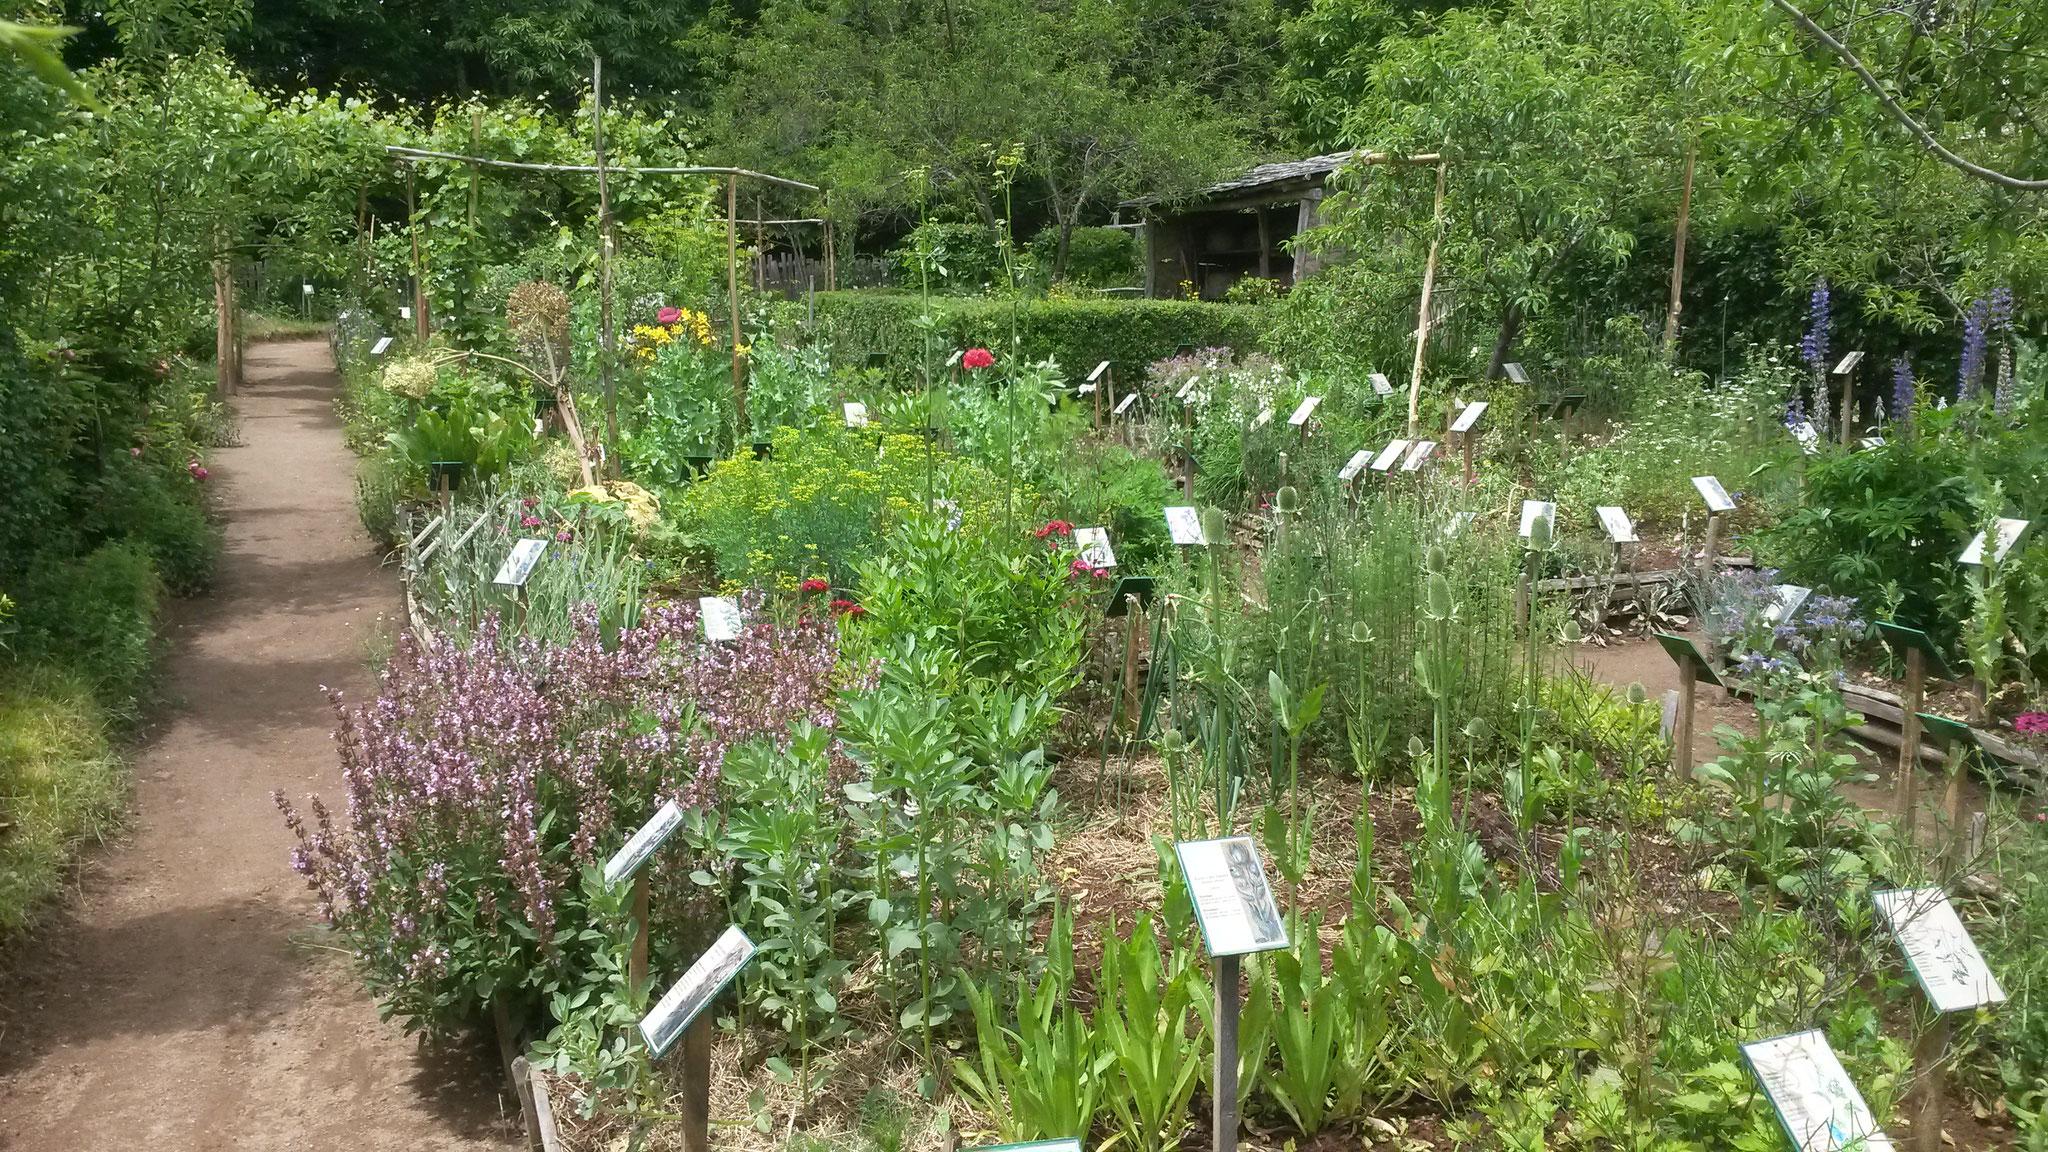 Le jardin m di val v ritable conservatoire botanique for Jardin veritable